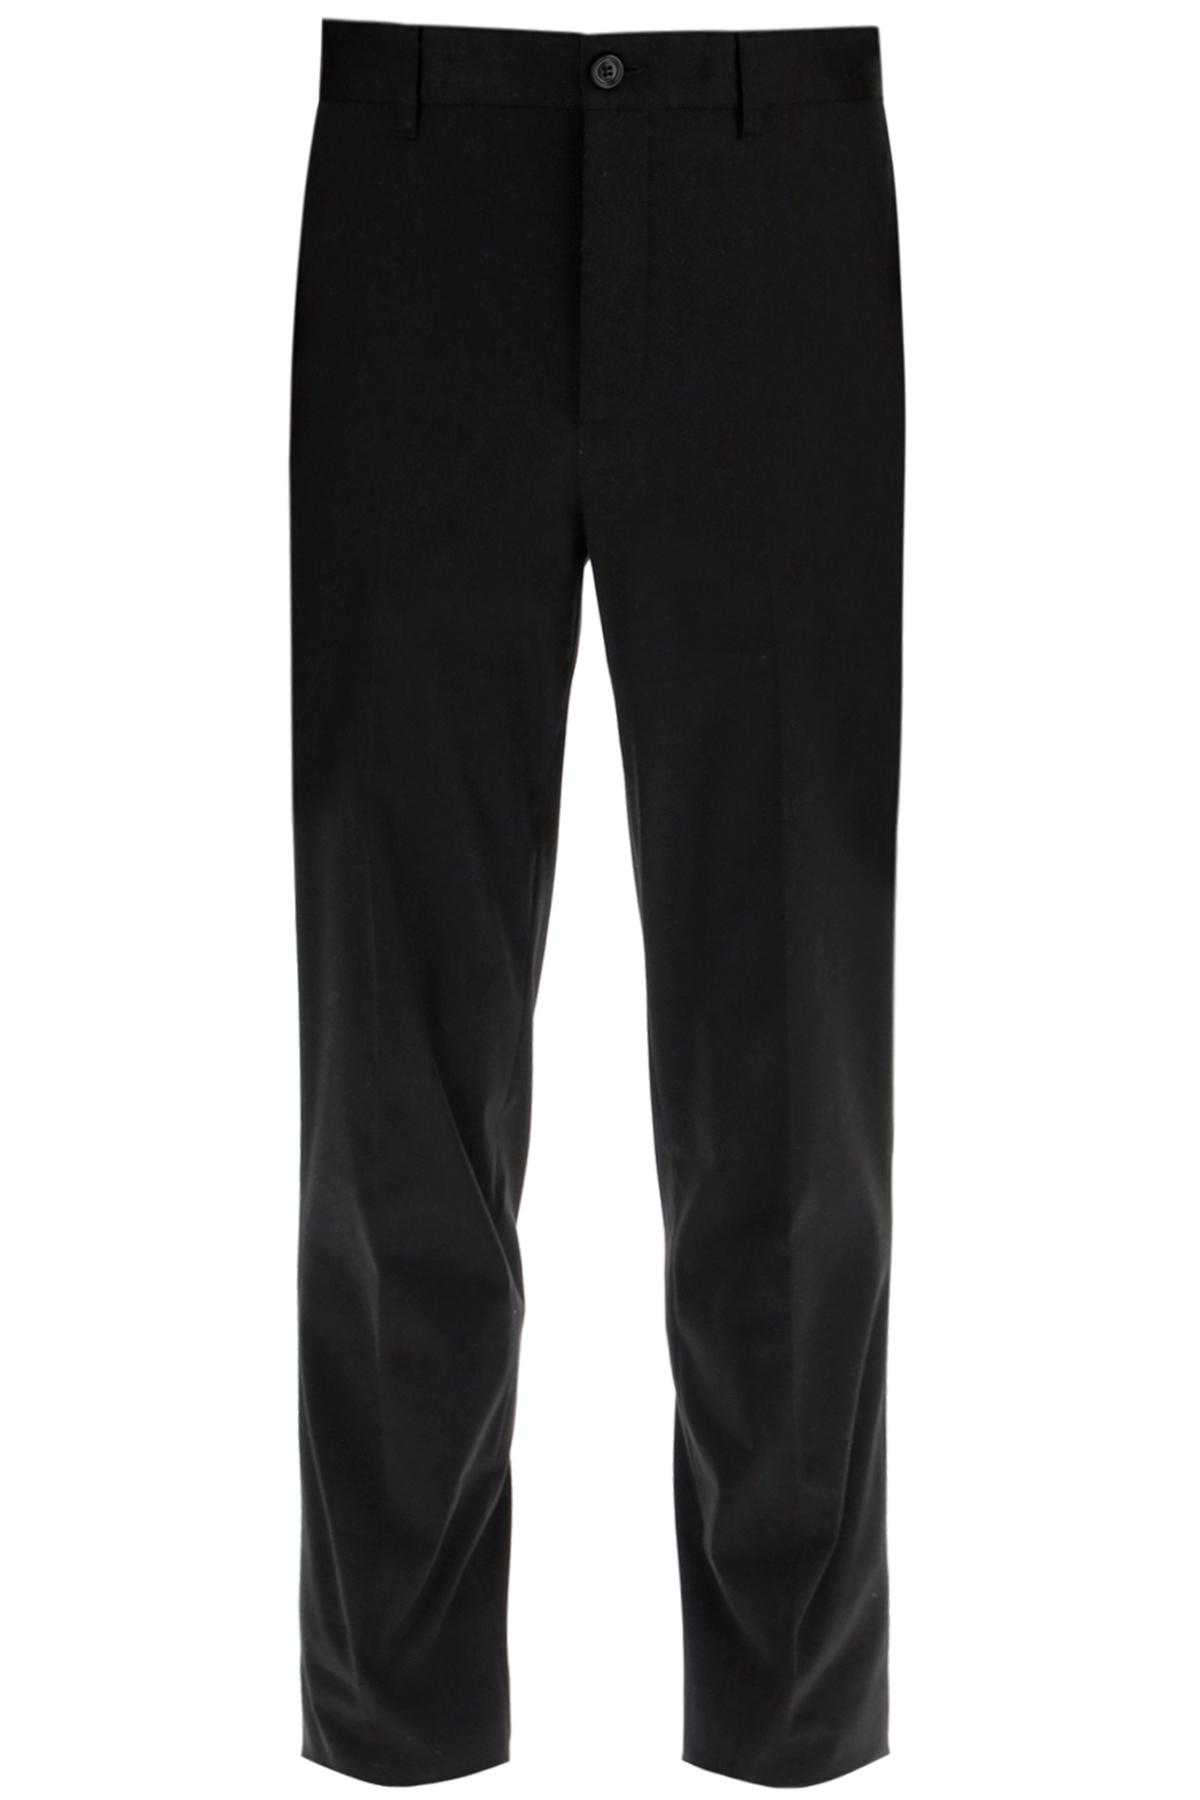 Dior pantaloni dickies